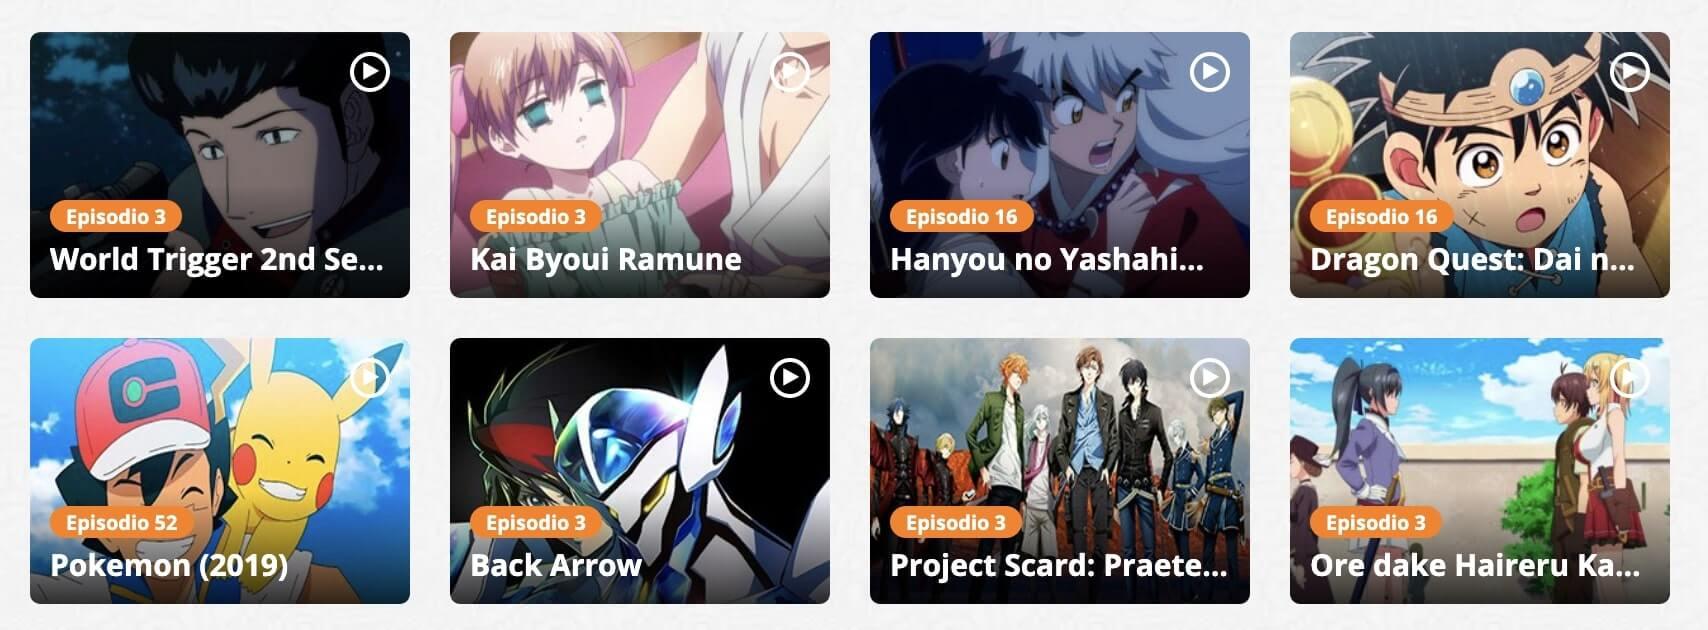 Ver anime gratis de forma legal